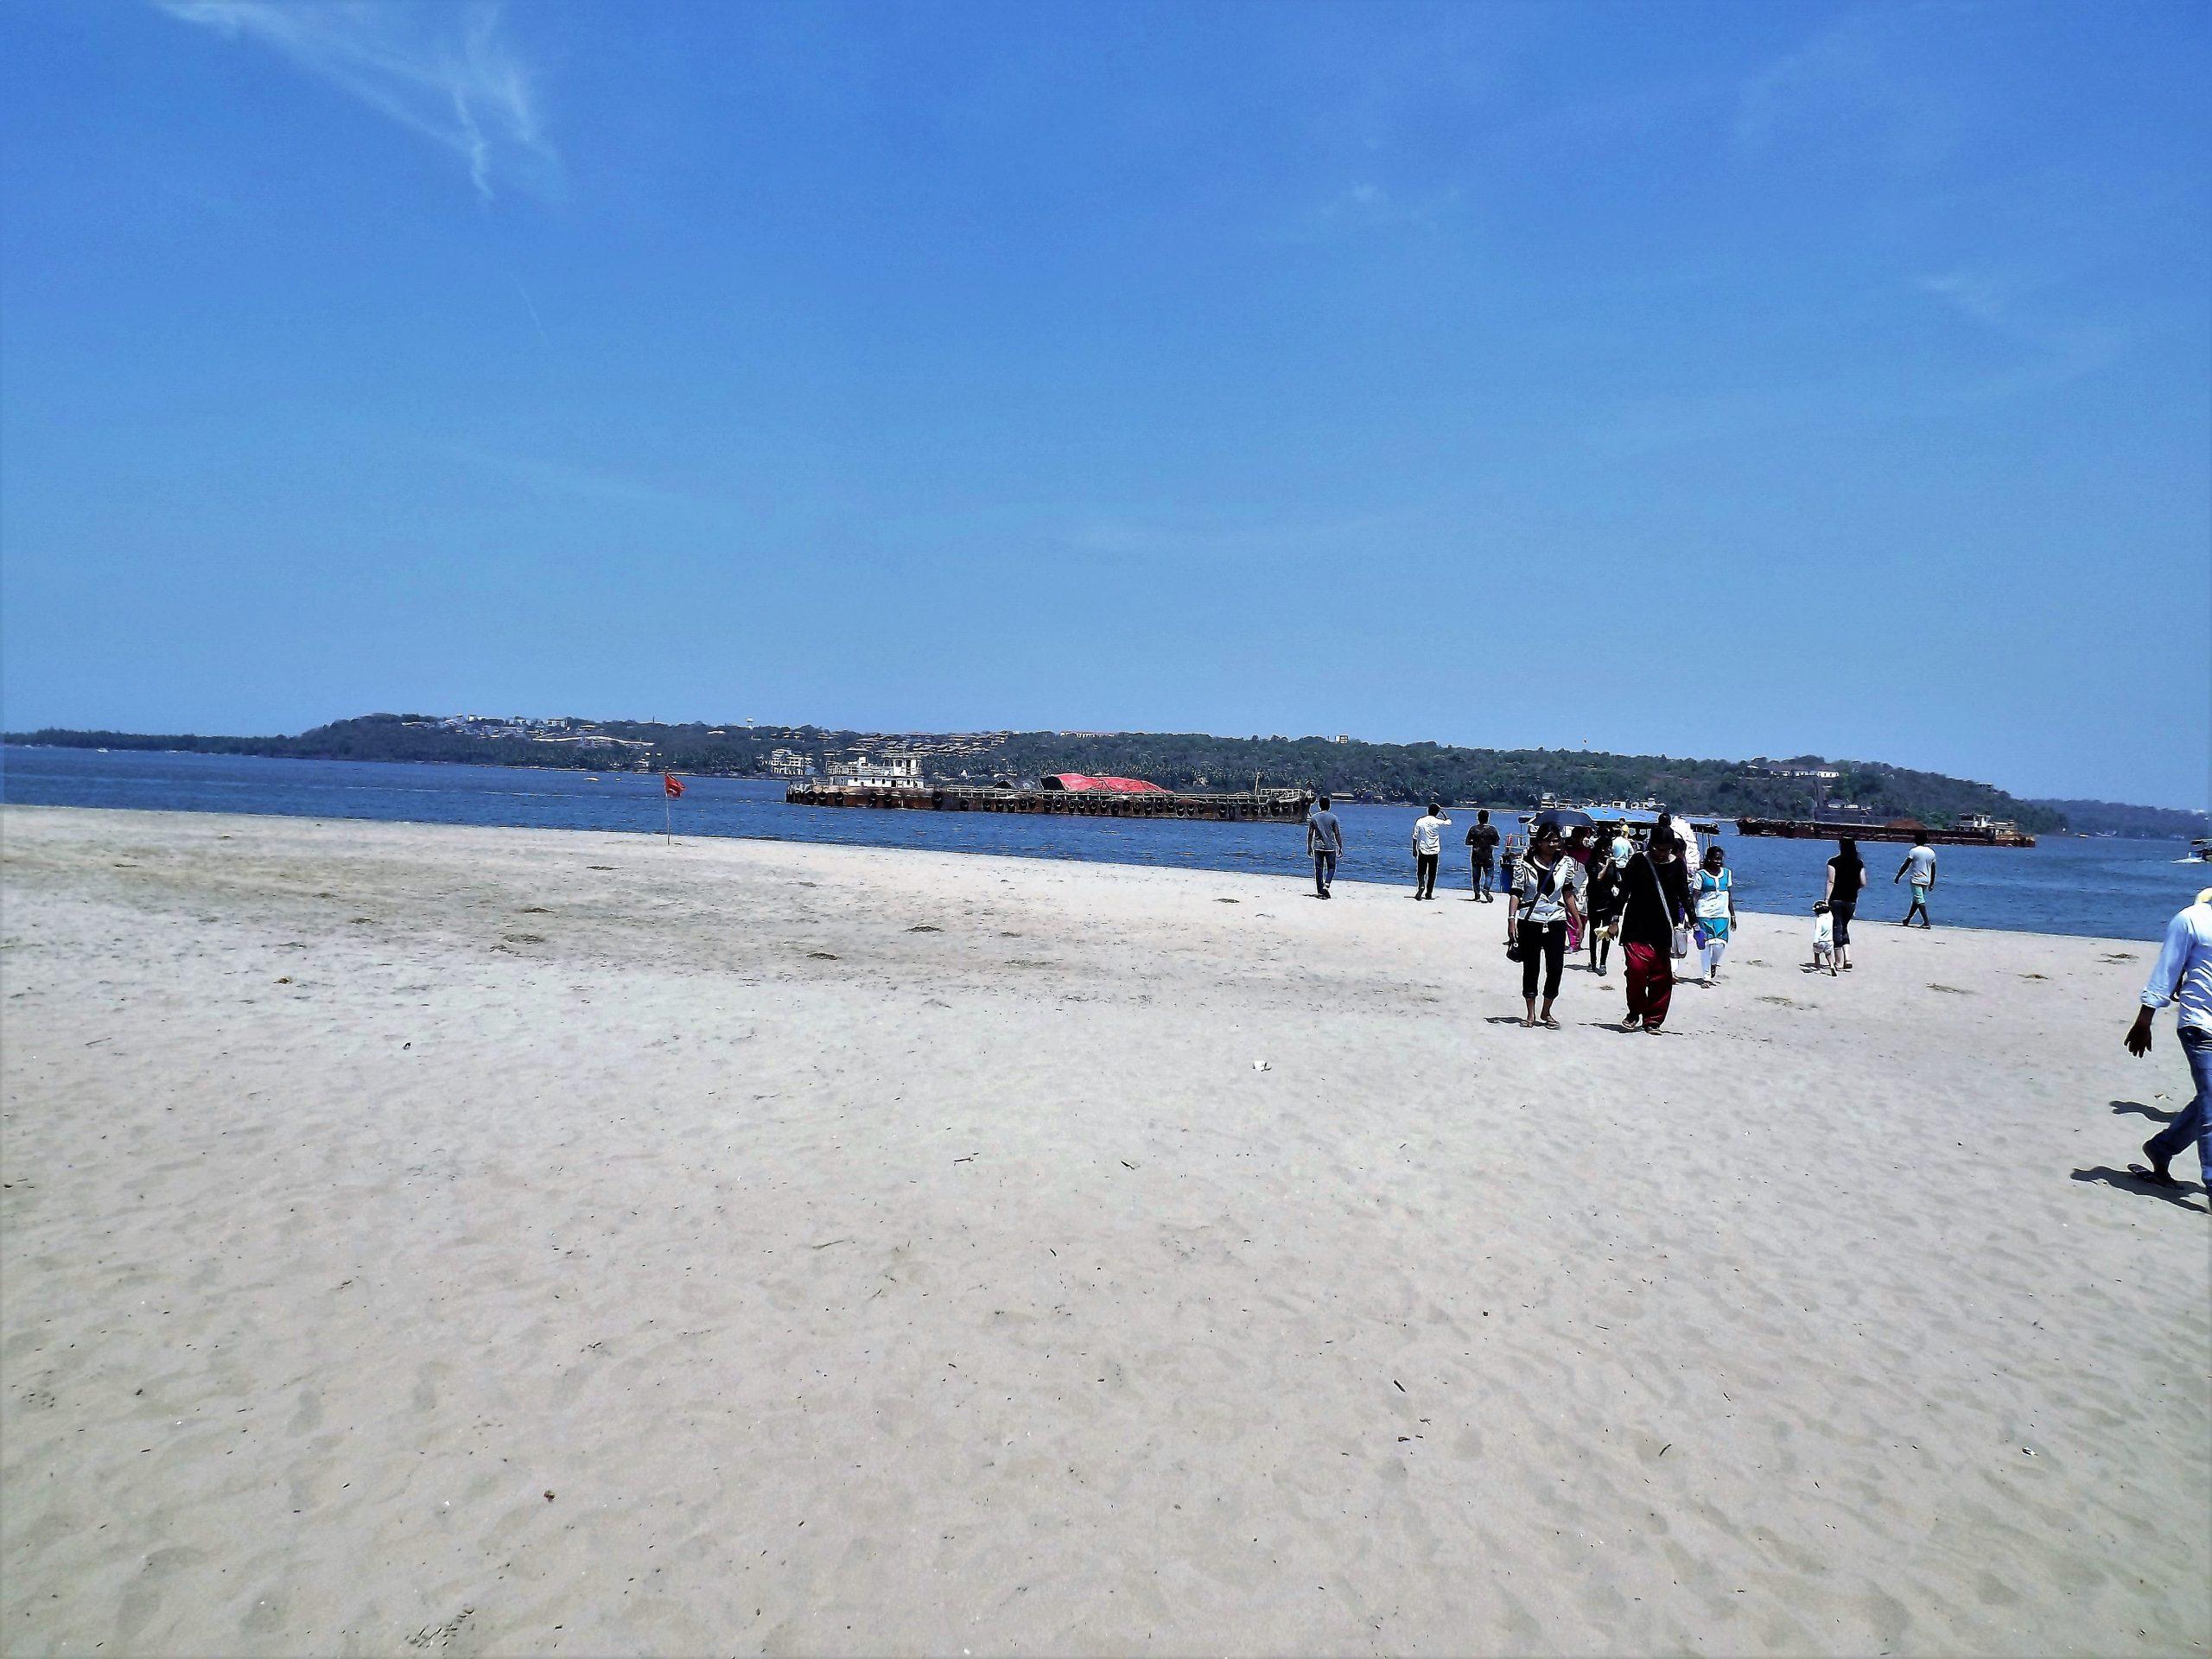 People at Goa beach